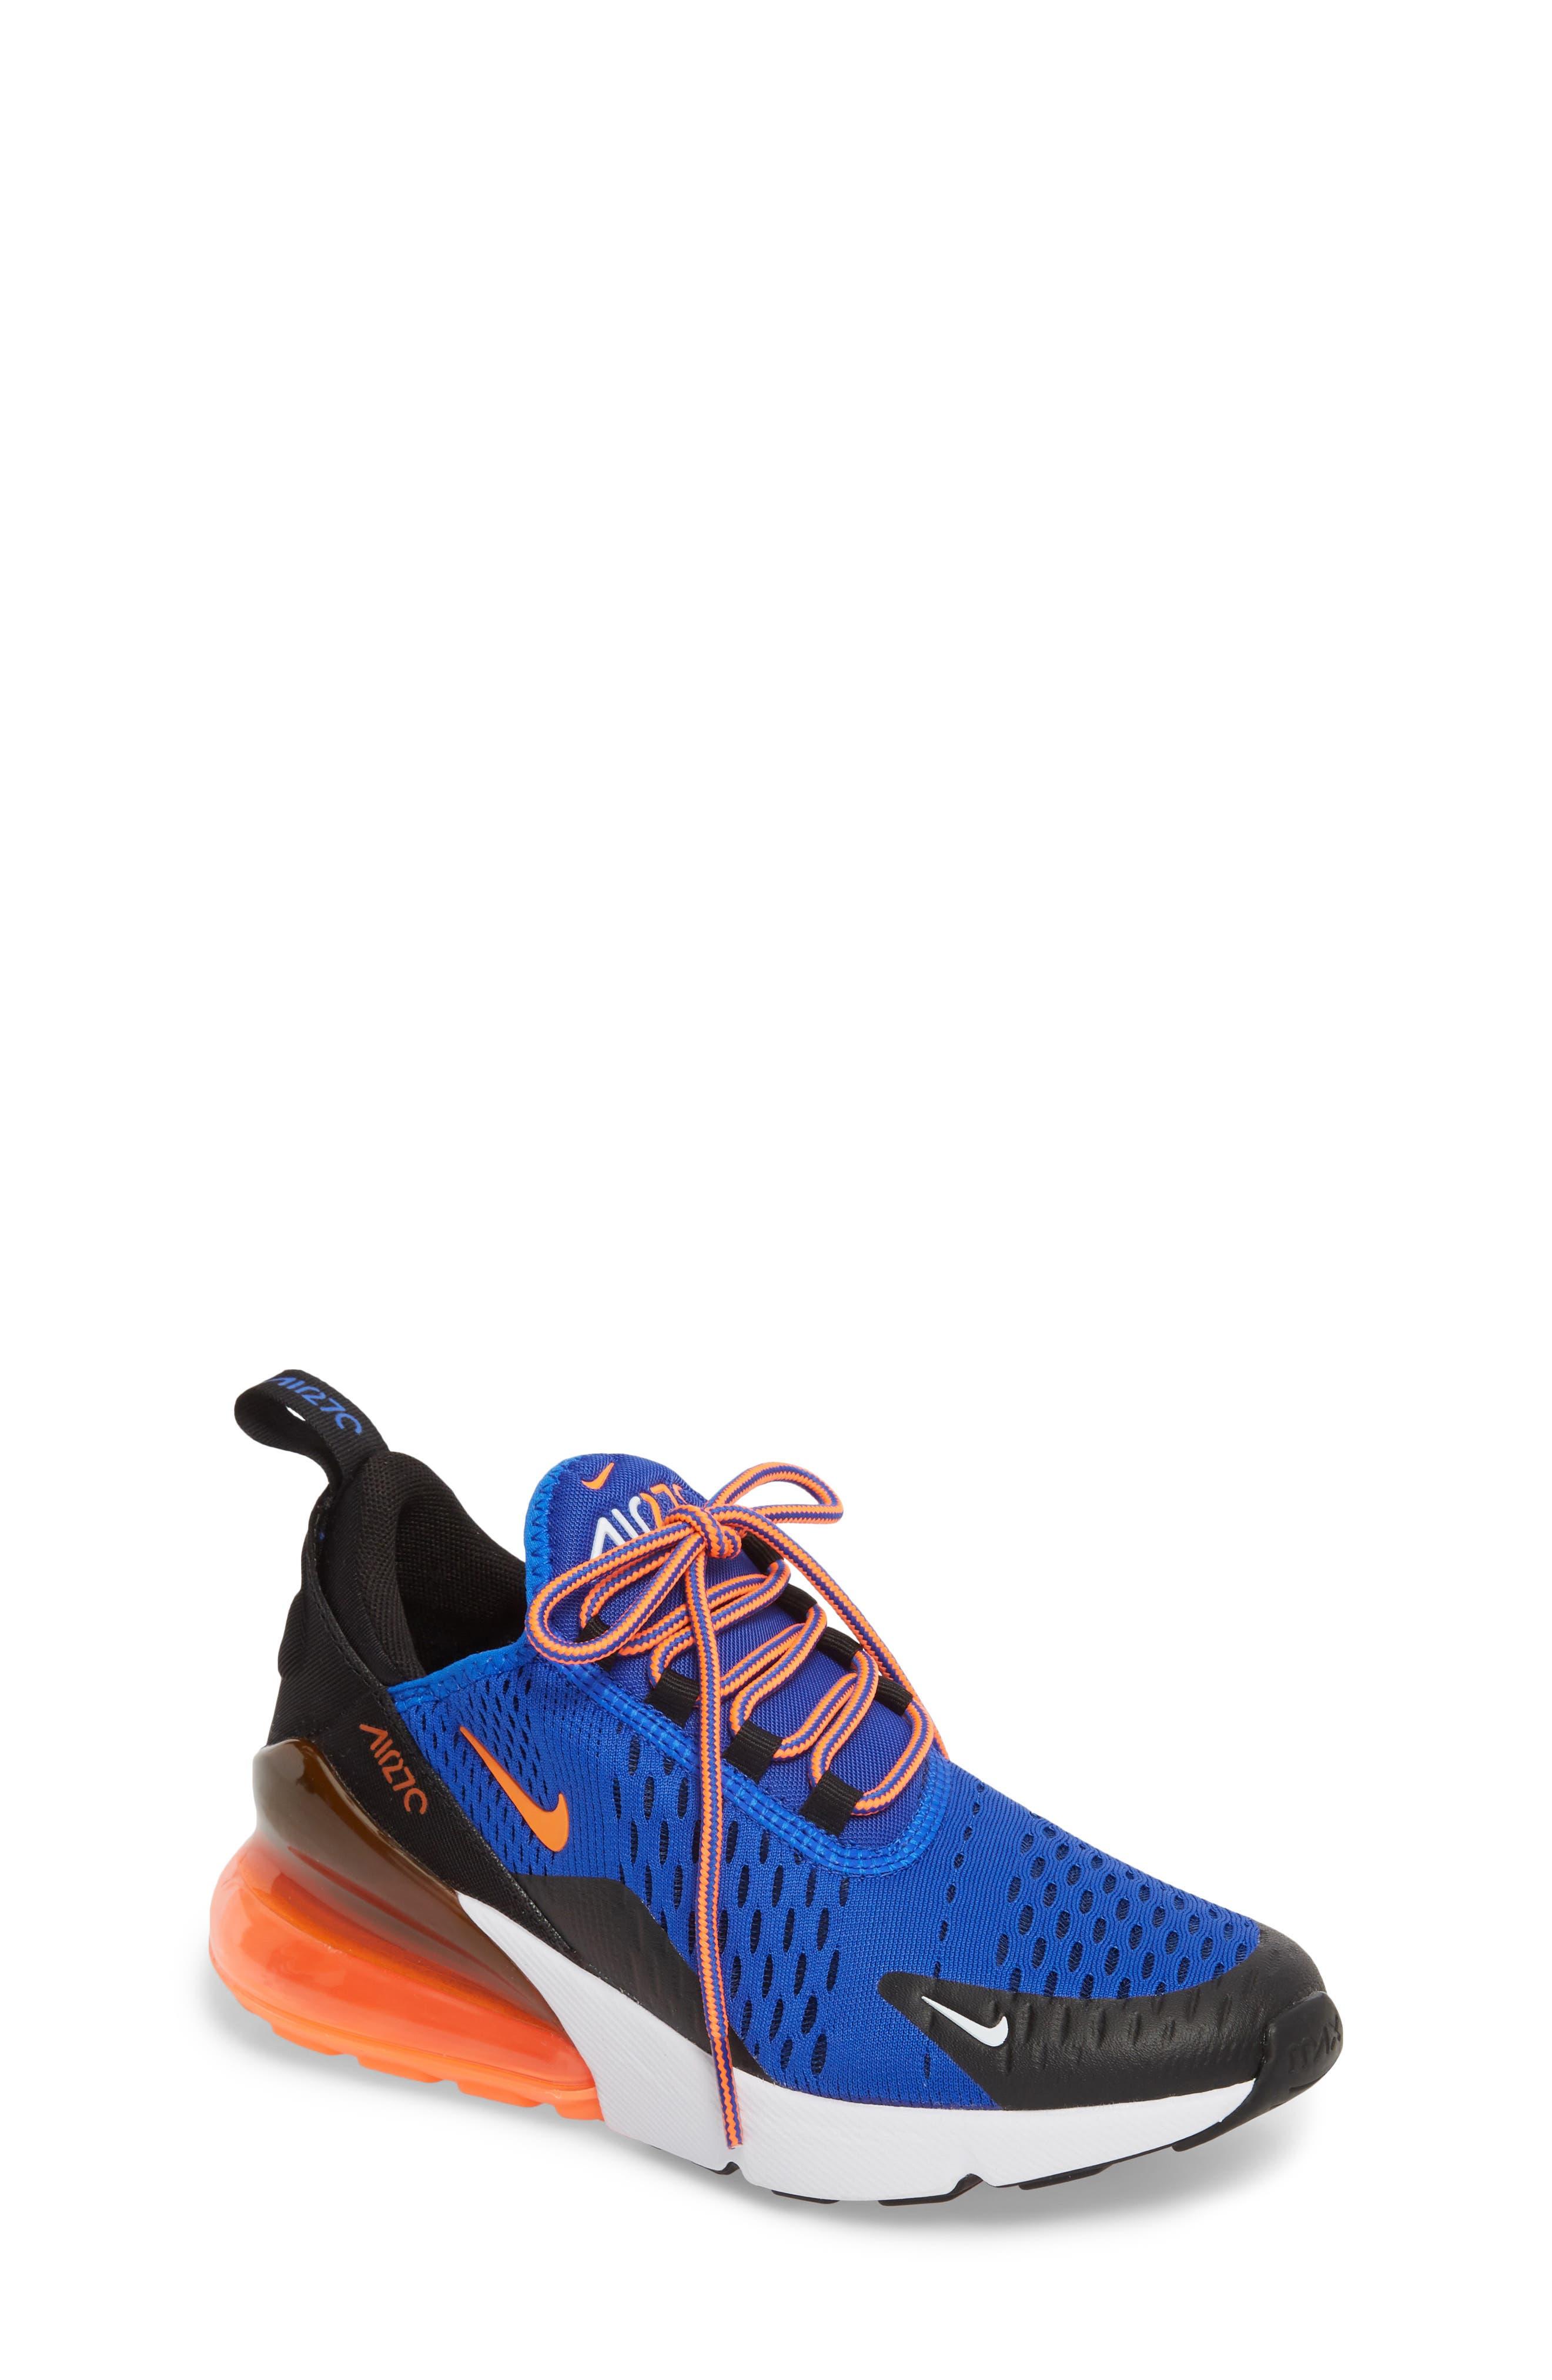 Air Max 270 Sneaker,                             Main thumbnail 1, color,                             Racer Blue/ Crimson/ Black